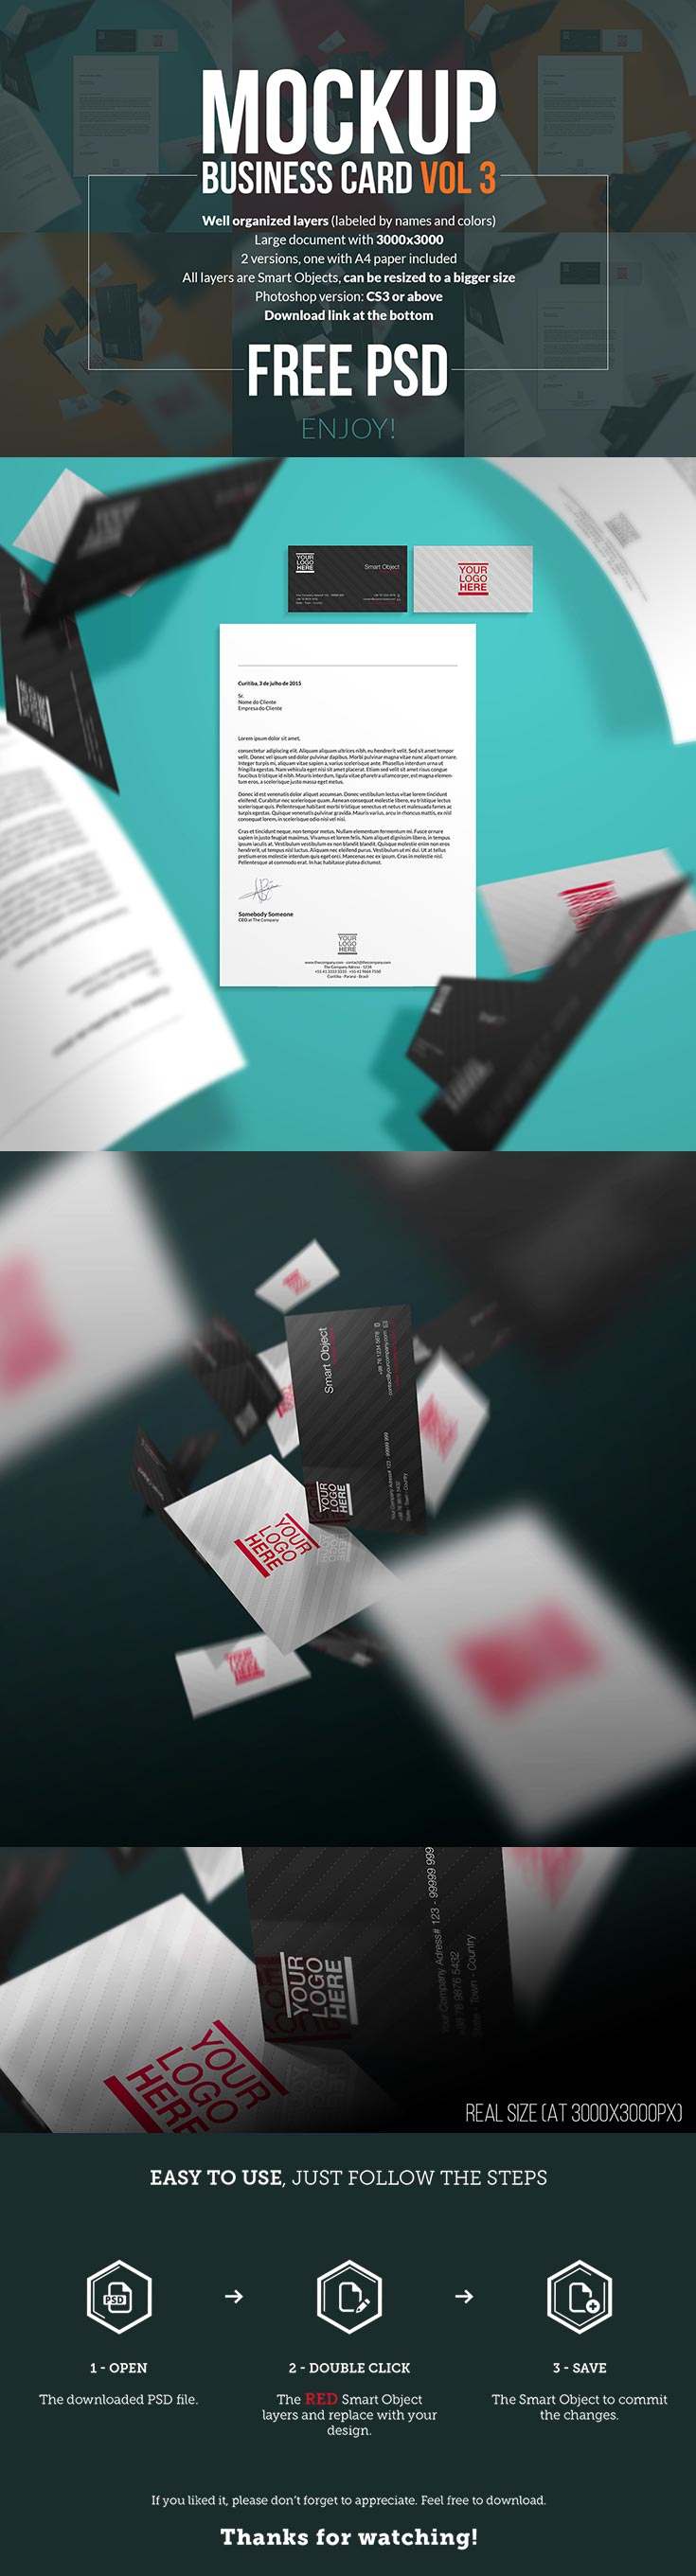 free business cards mockups vol 3 — creativetacos